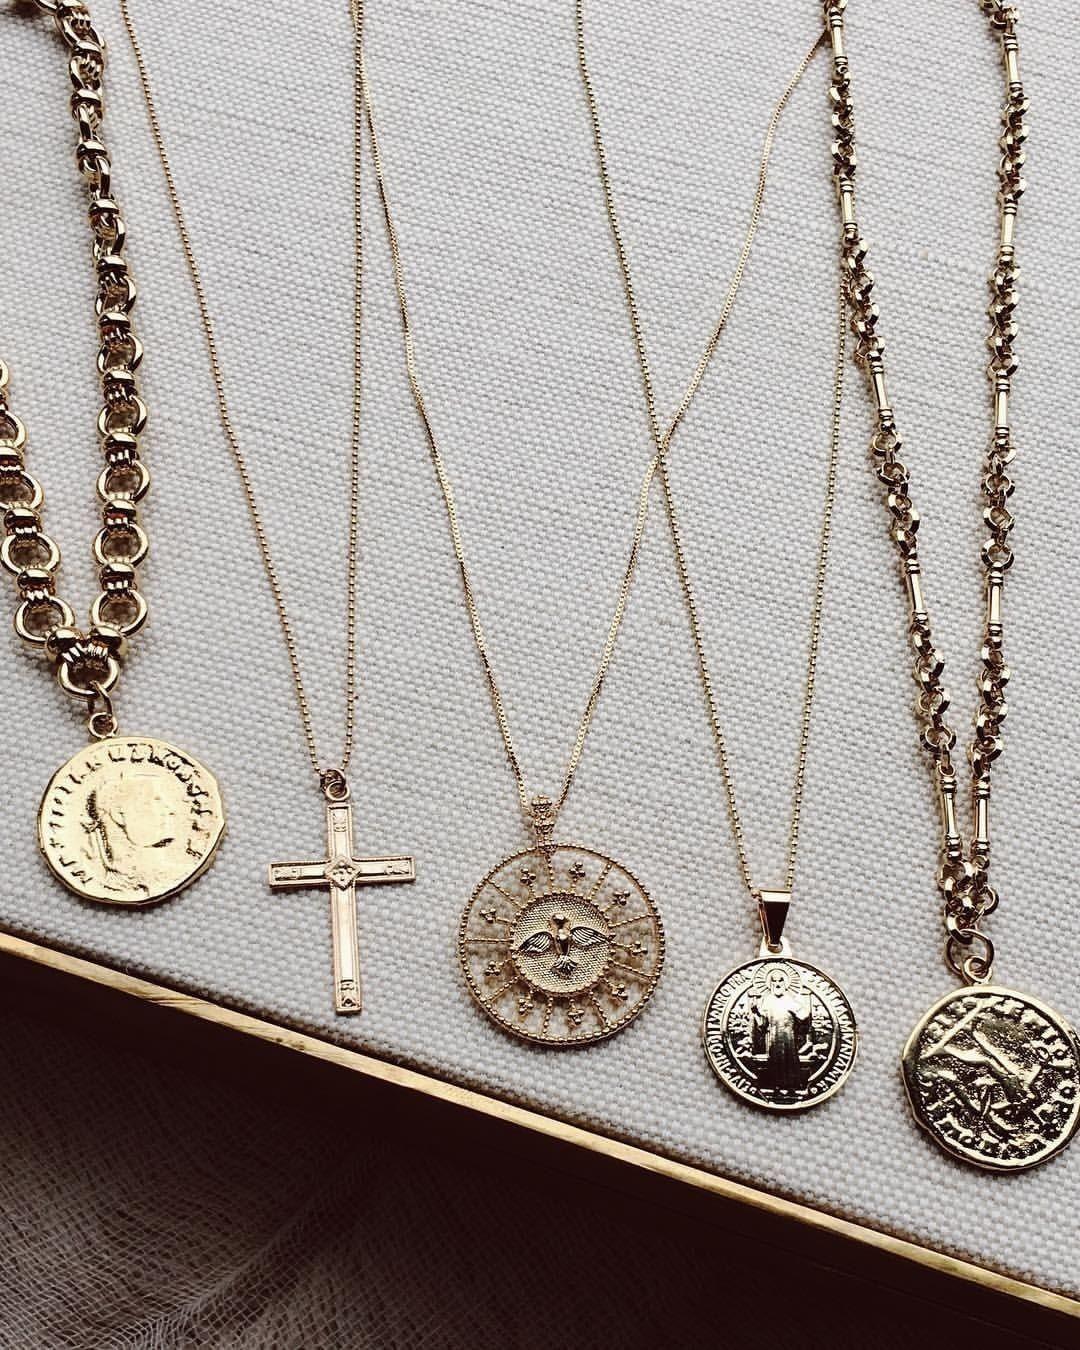 Coin pendant necklaces